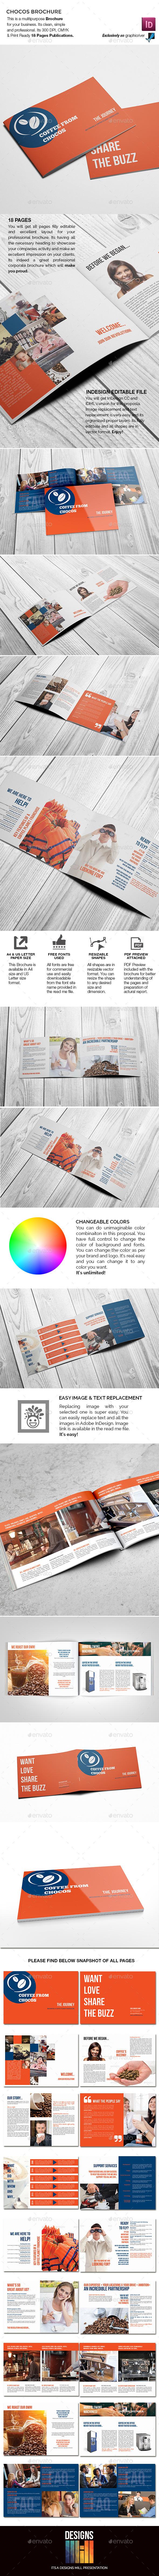 Chocos Landscape Brochure - Informational Brochures